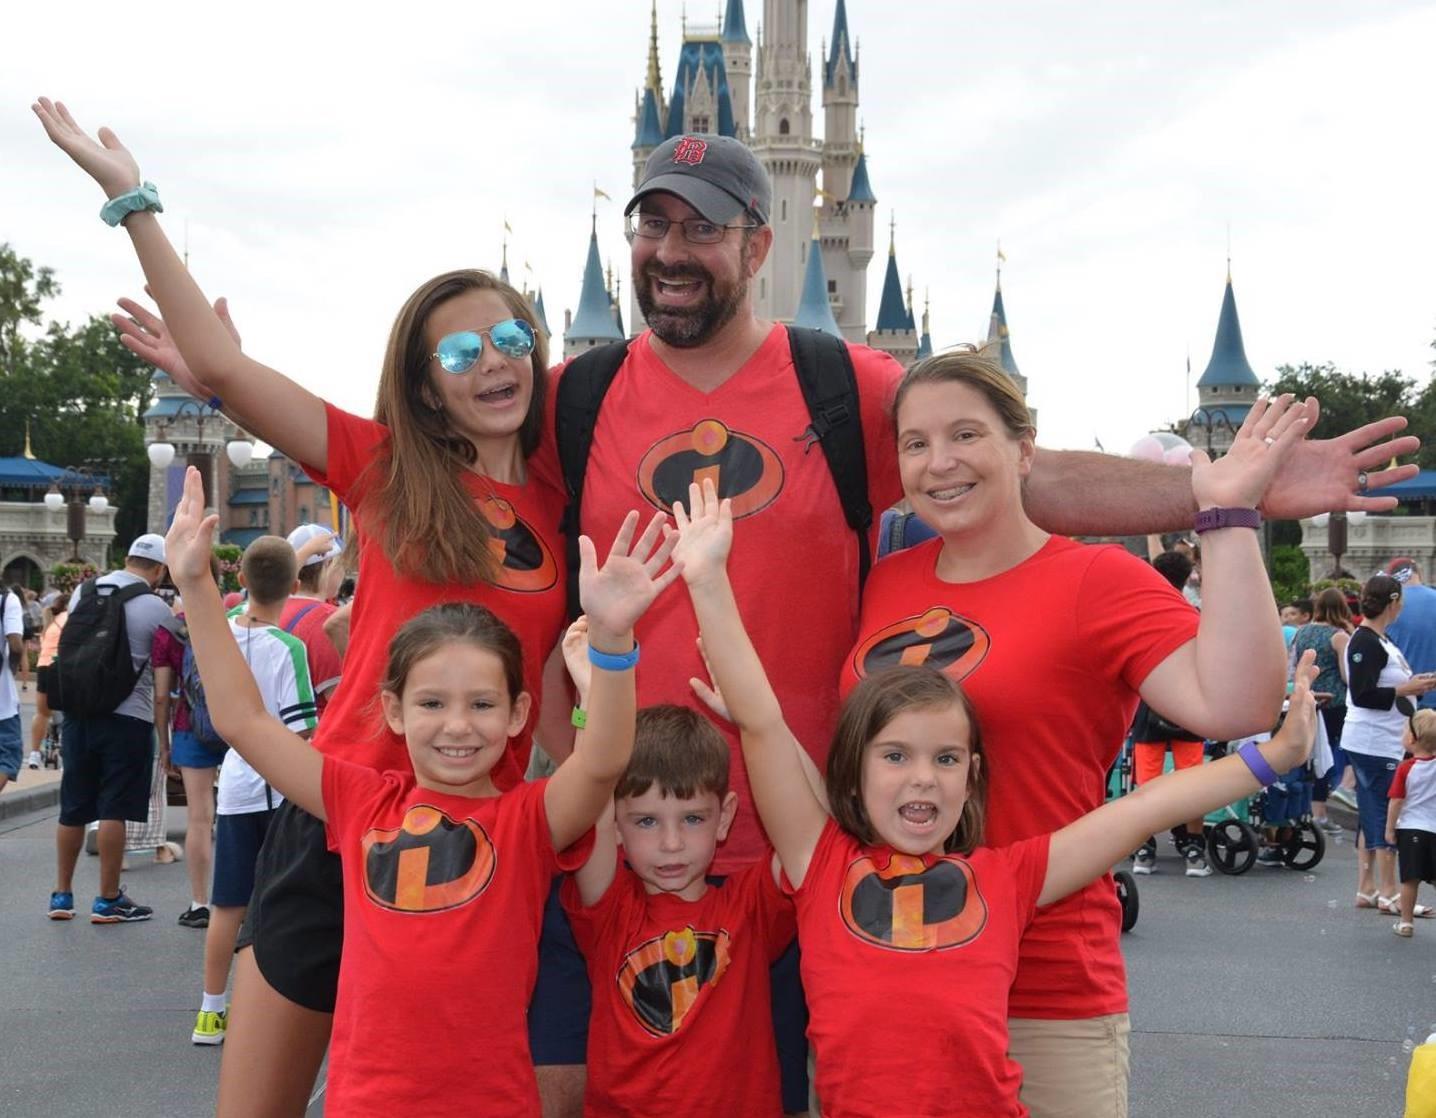 Scott, Beth, and their four children in Magic Kingdom